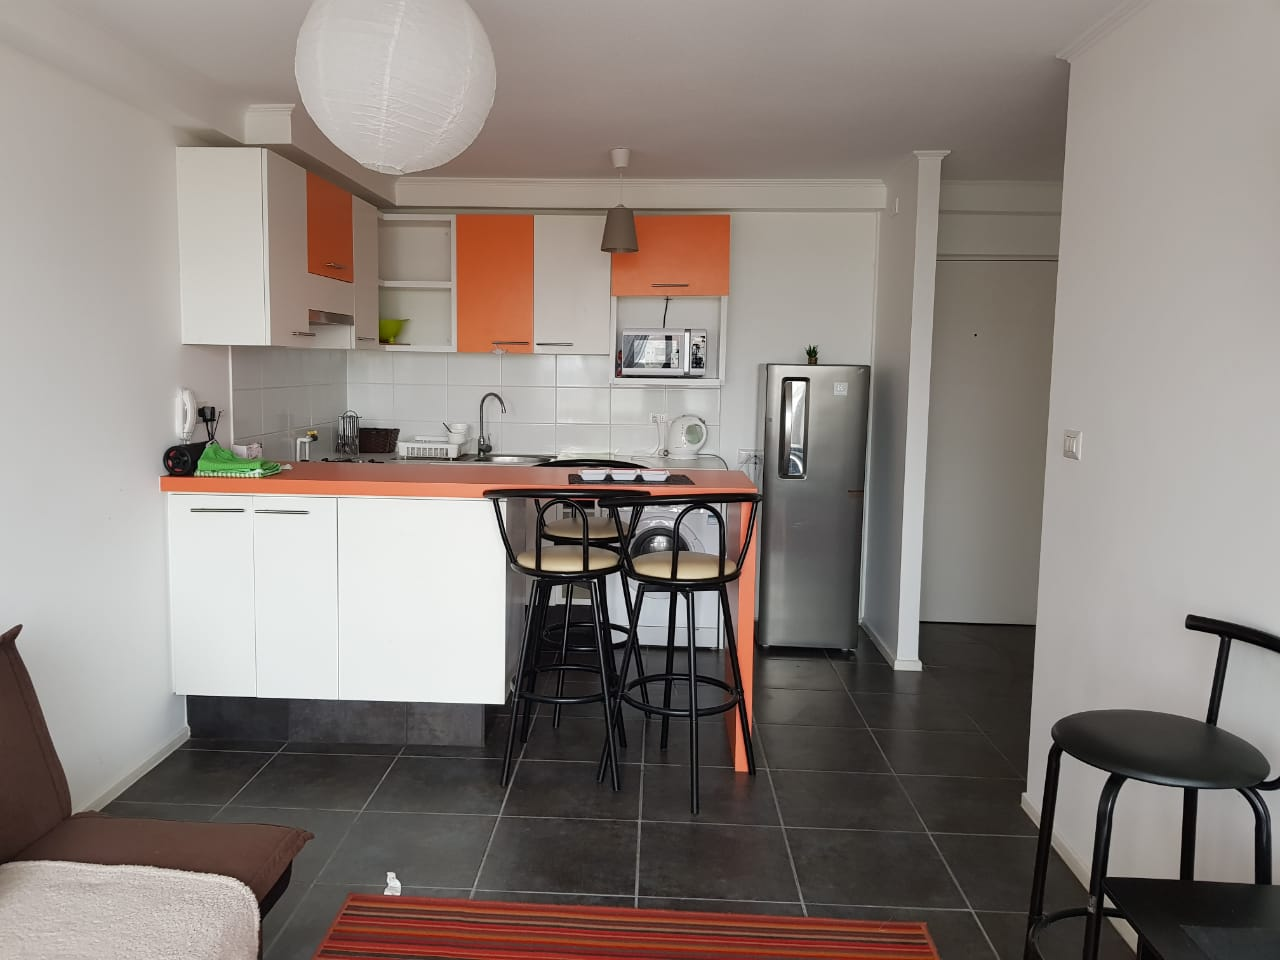 Condominio Playa blanca, 2.680 UF